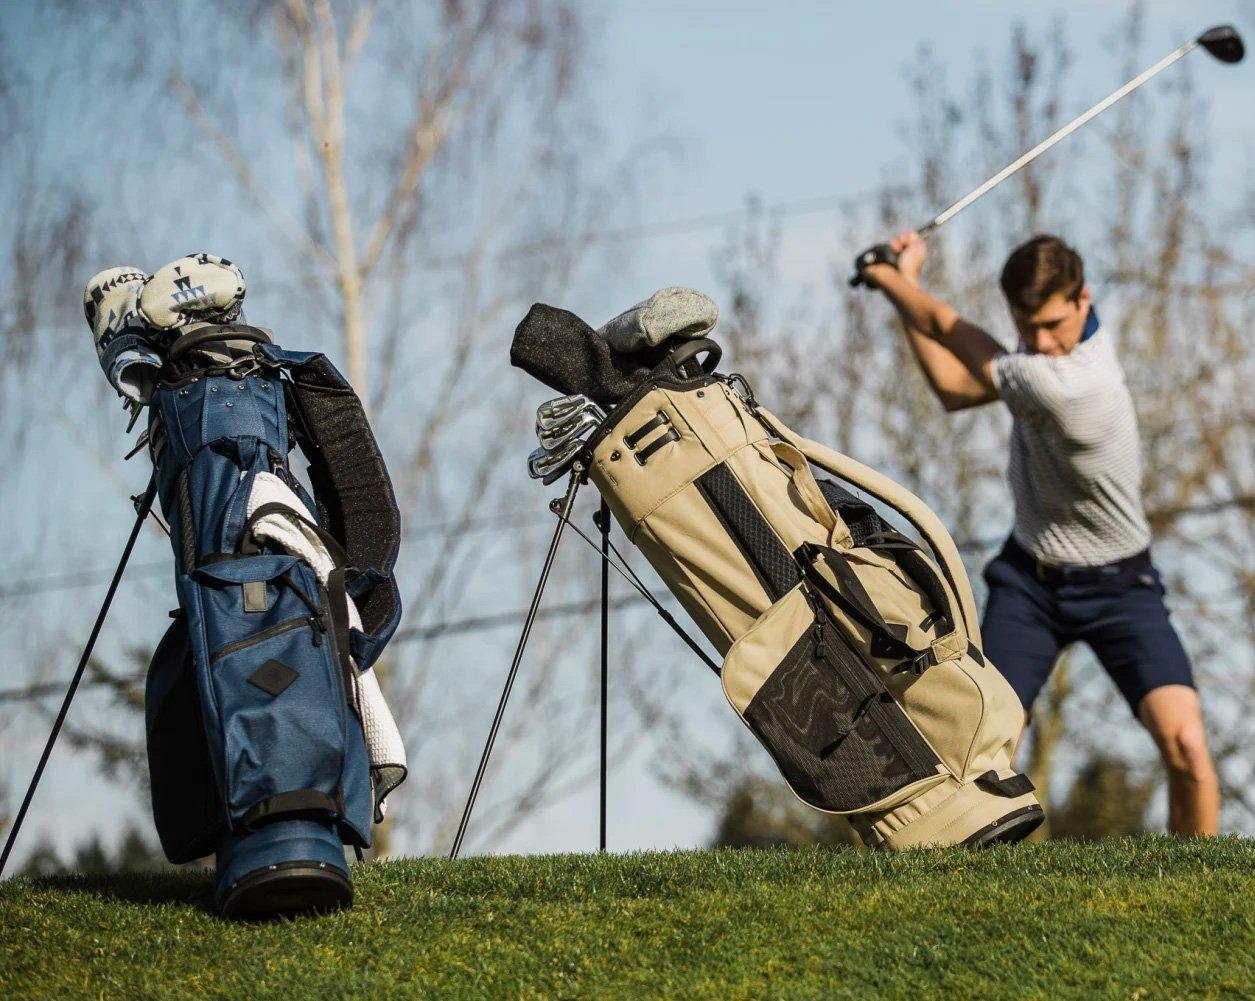 Jones' Lightweight Utility Trouper is the New Golf Bag Dad Deserves at werd.com